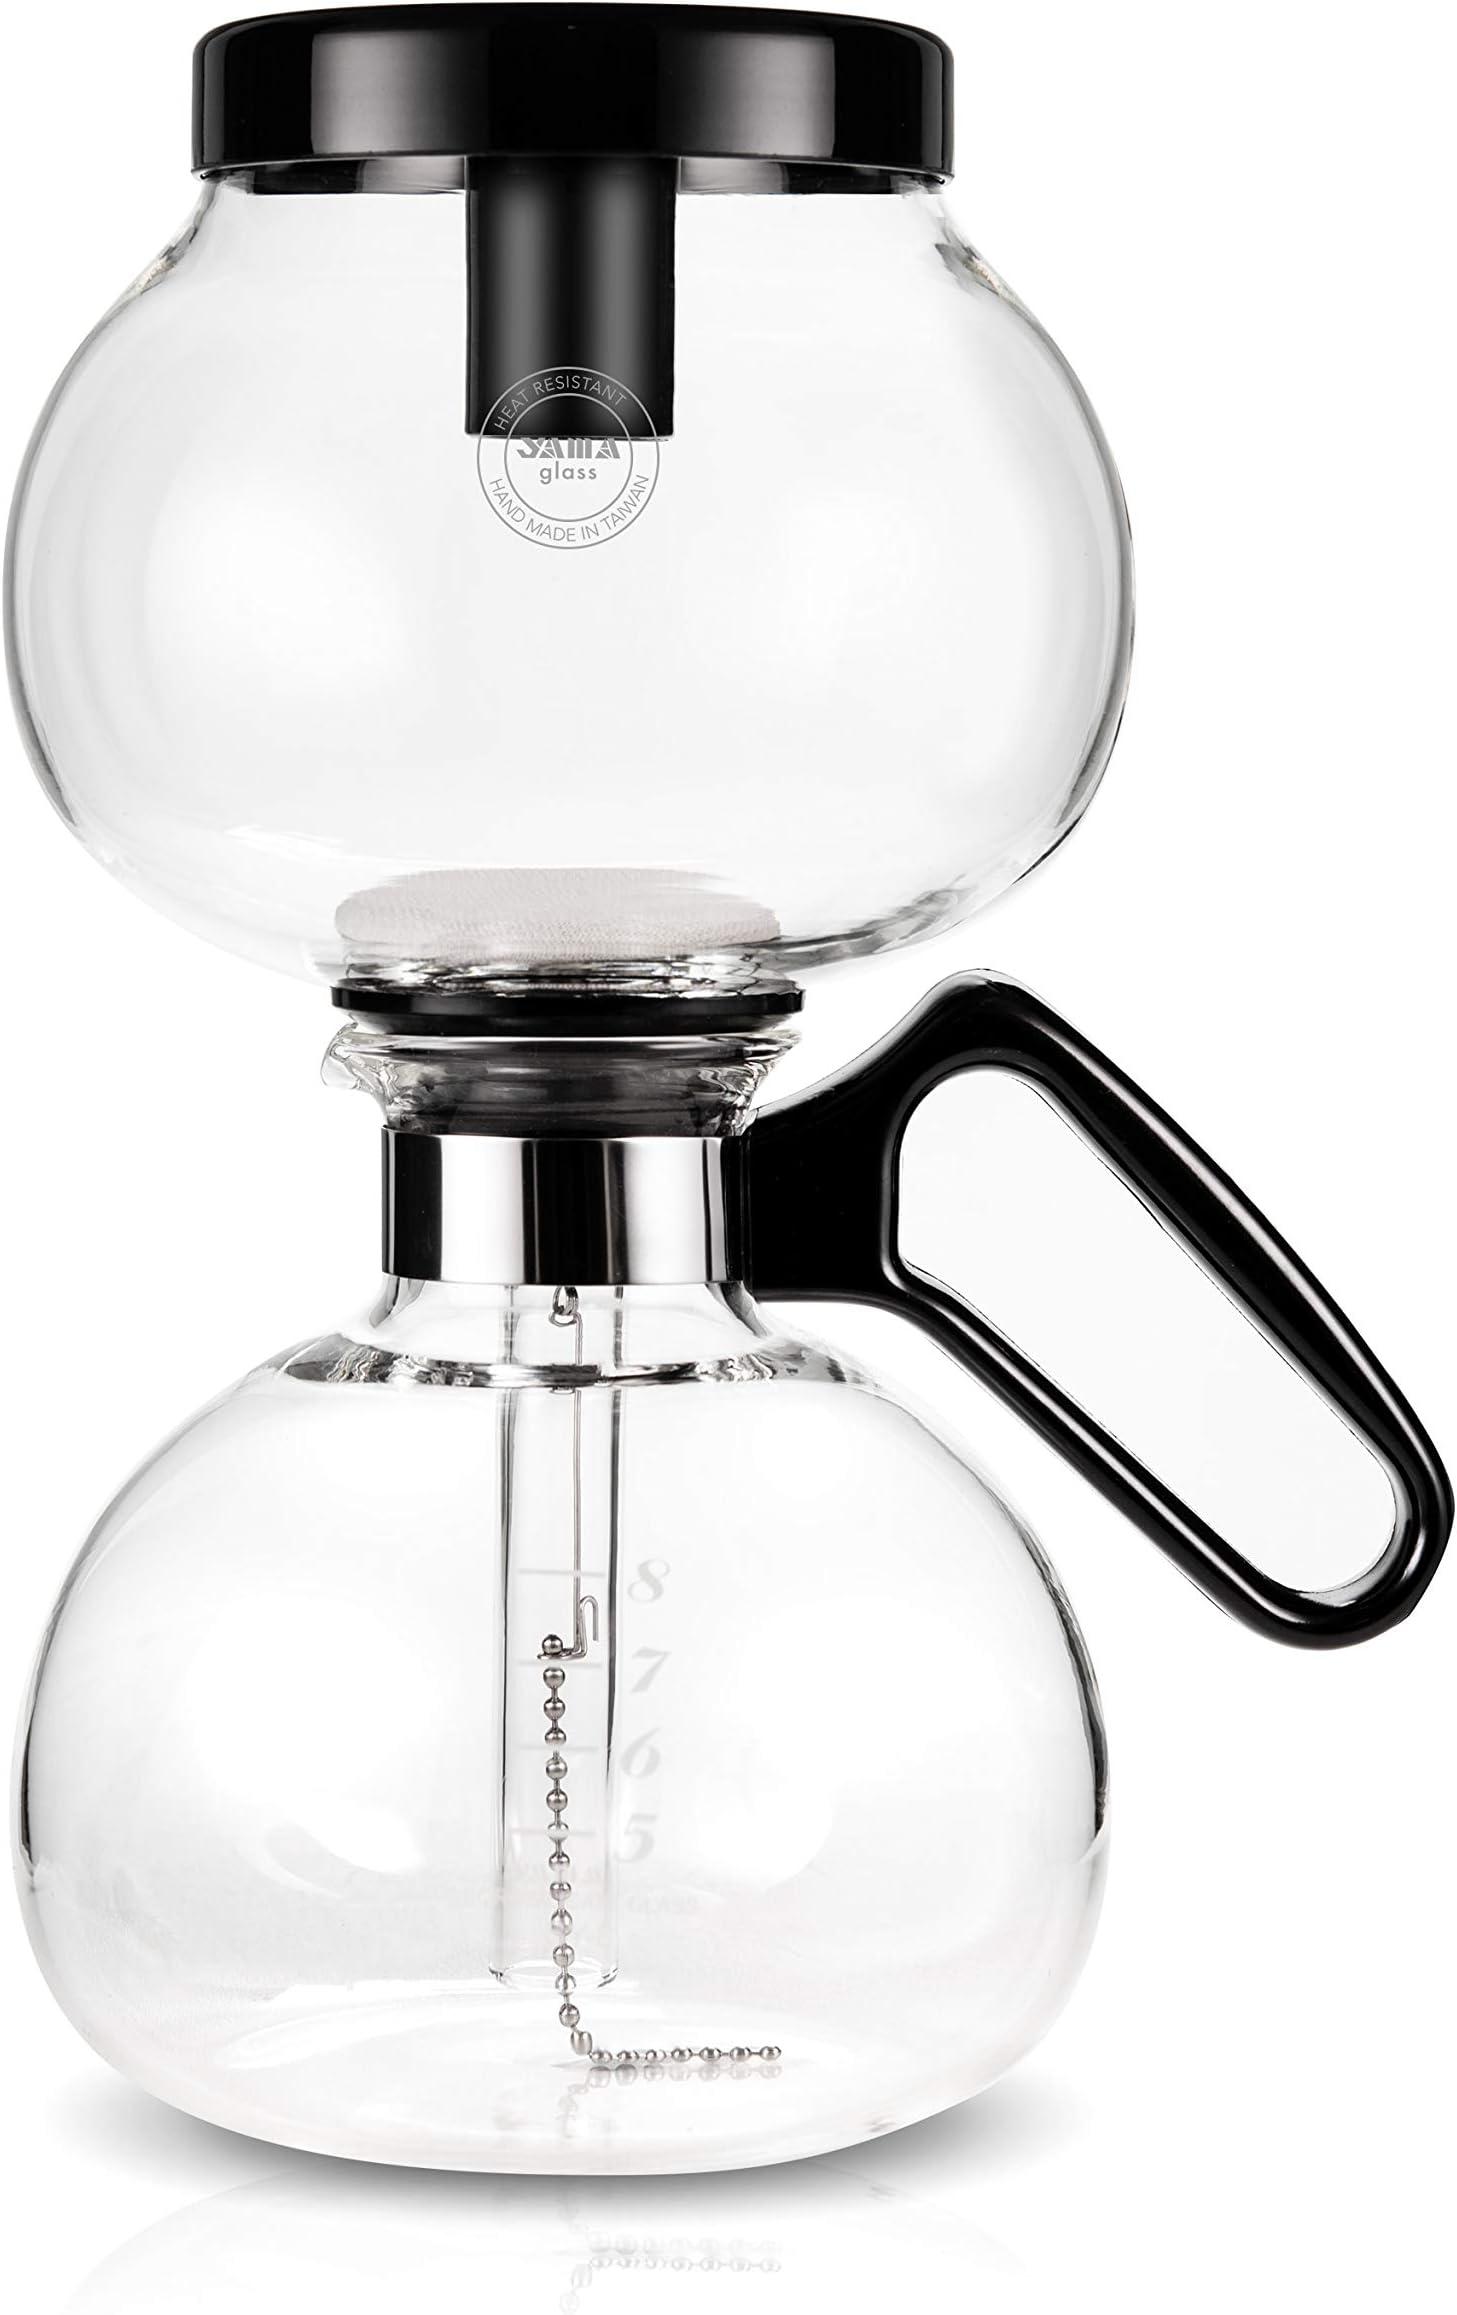 Yama Siphon 8 Cup/32oz/950ml Stove Top Coffee Maker